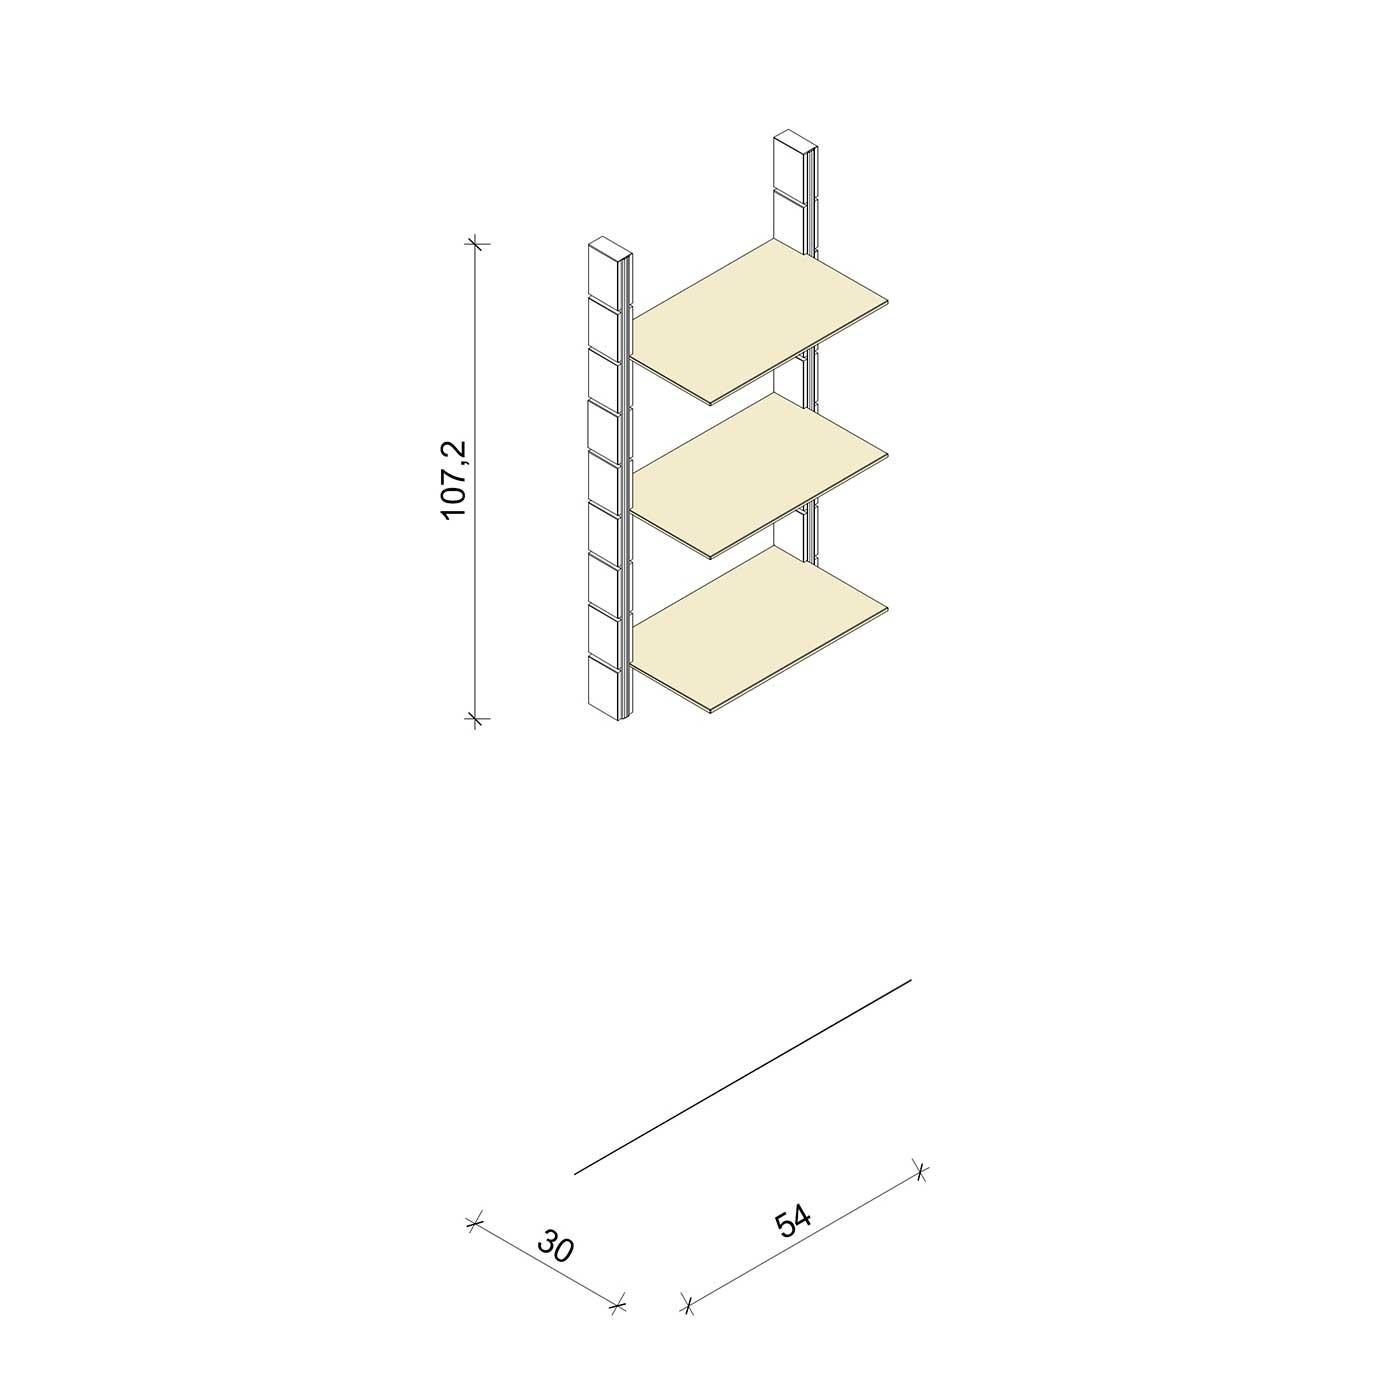 Bücherregal - Comfort (M) 54 - Maß: 54 x 107,2 x 30 cm (B x H x T)